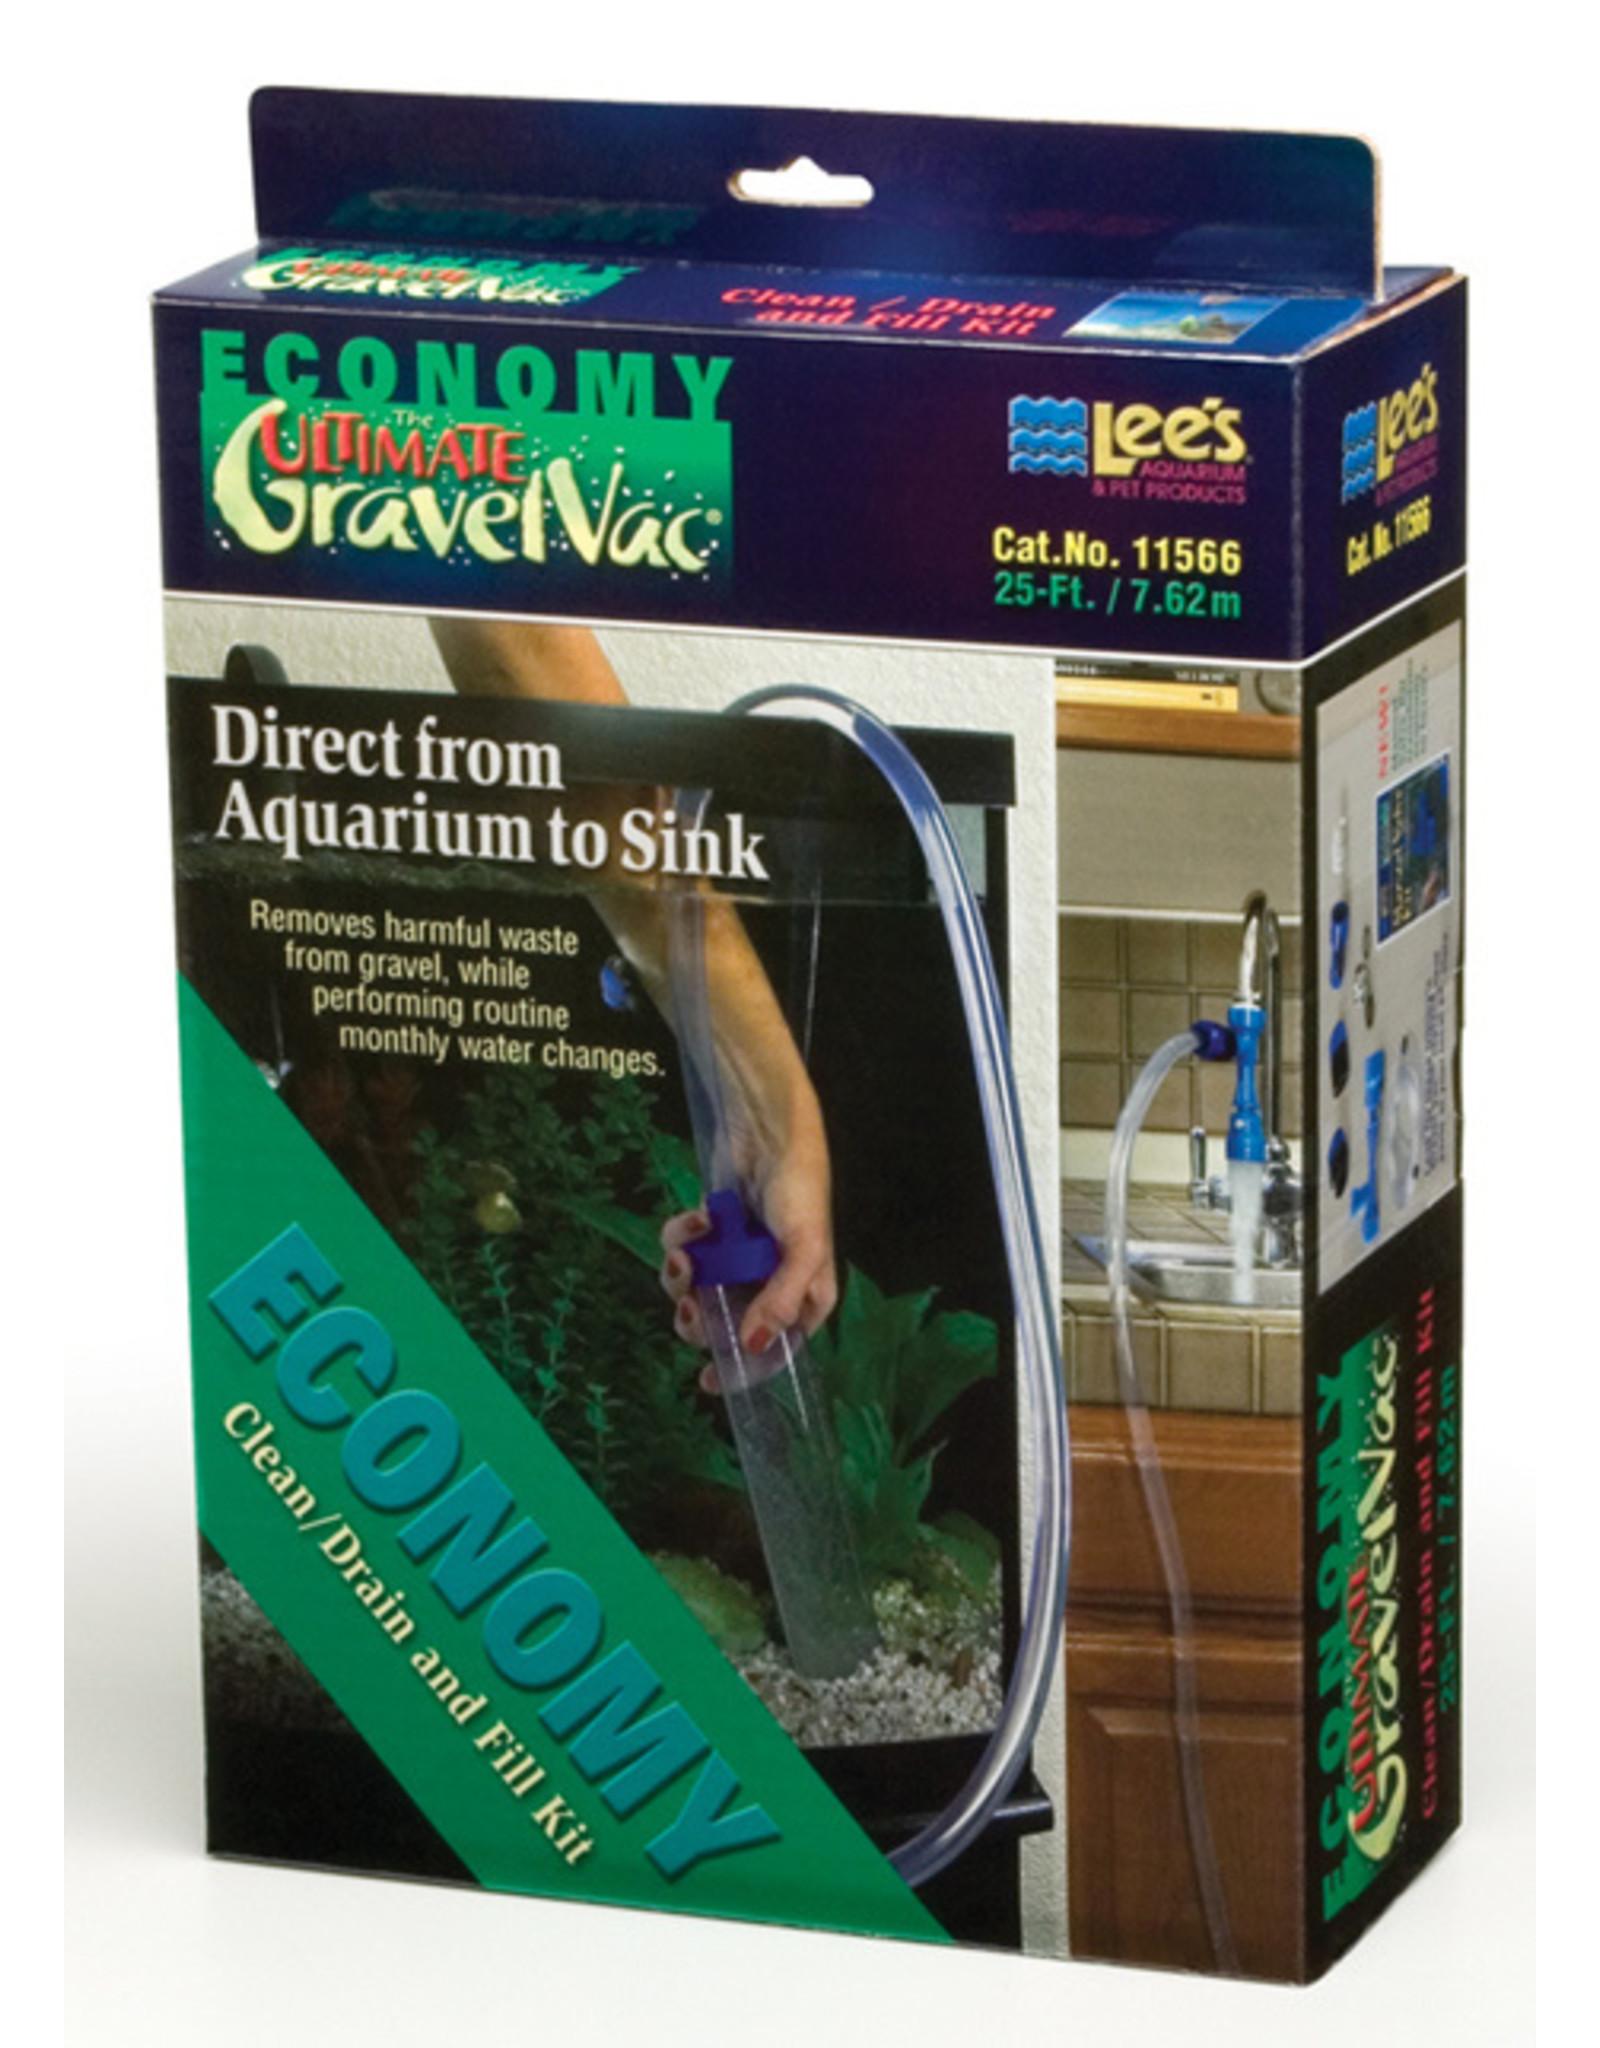 Lee's LEE'S Economy Ultimate Gravel Vac 25' Kit